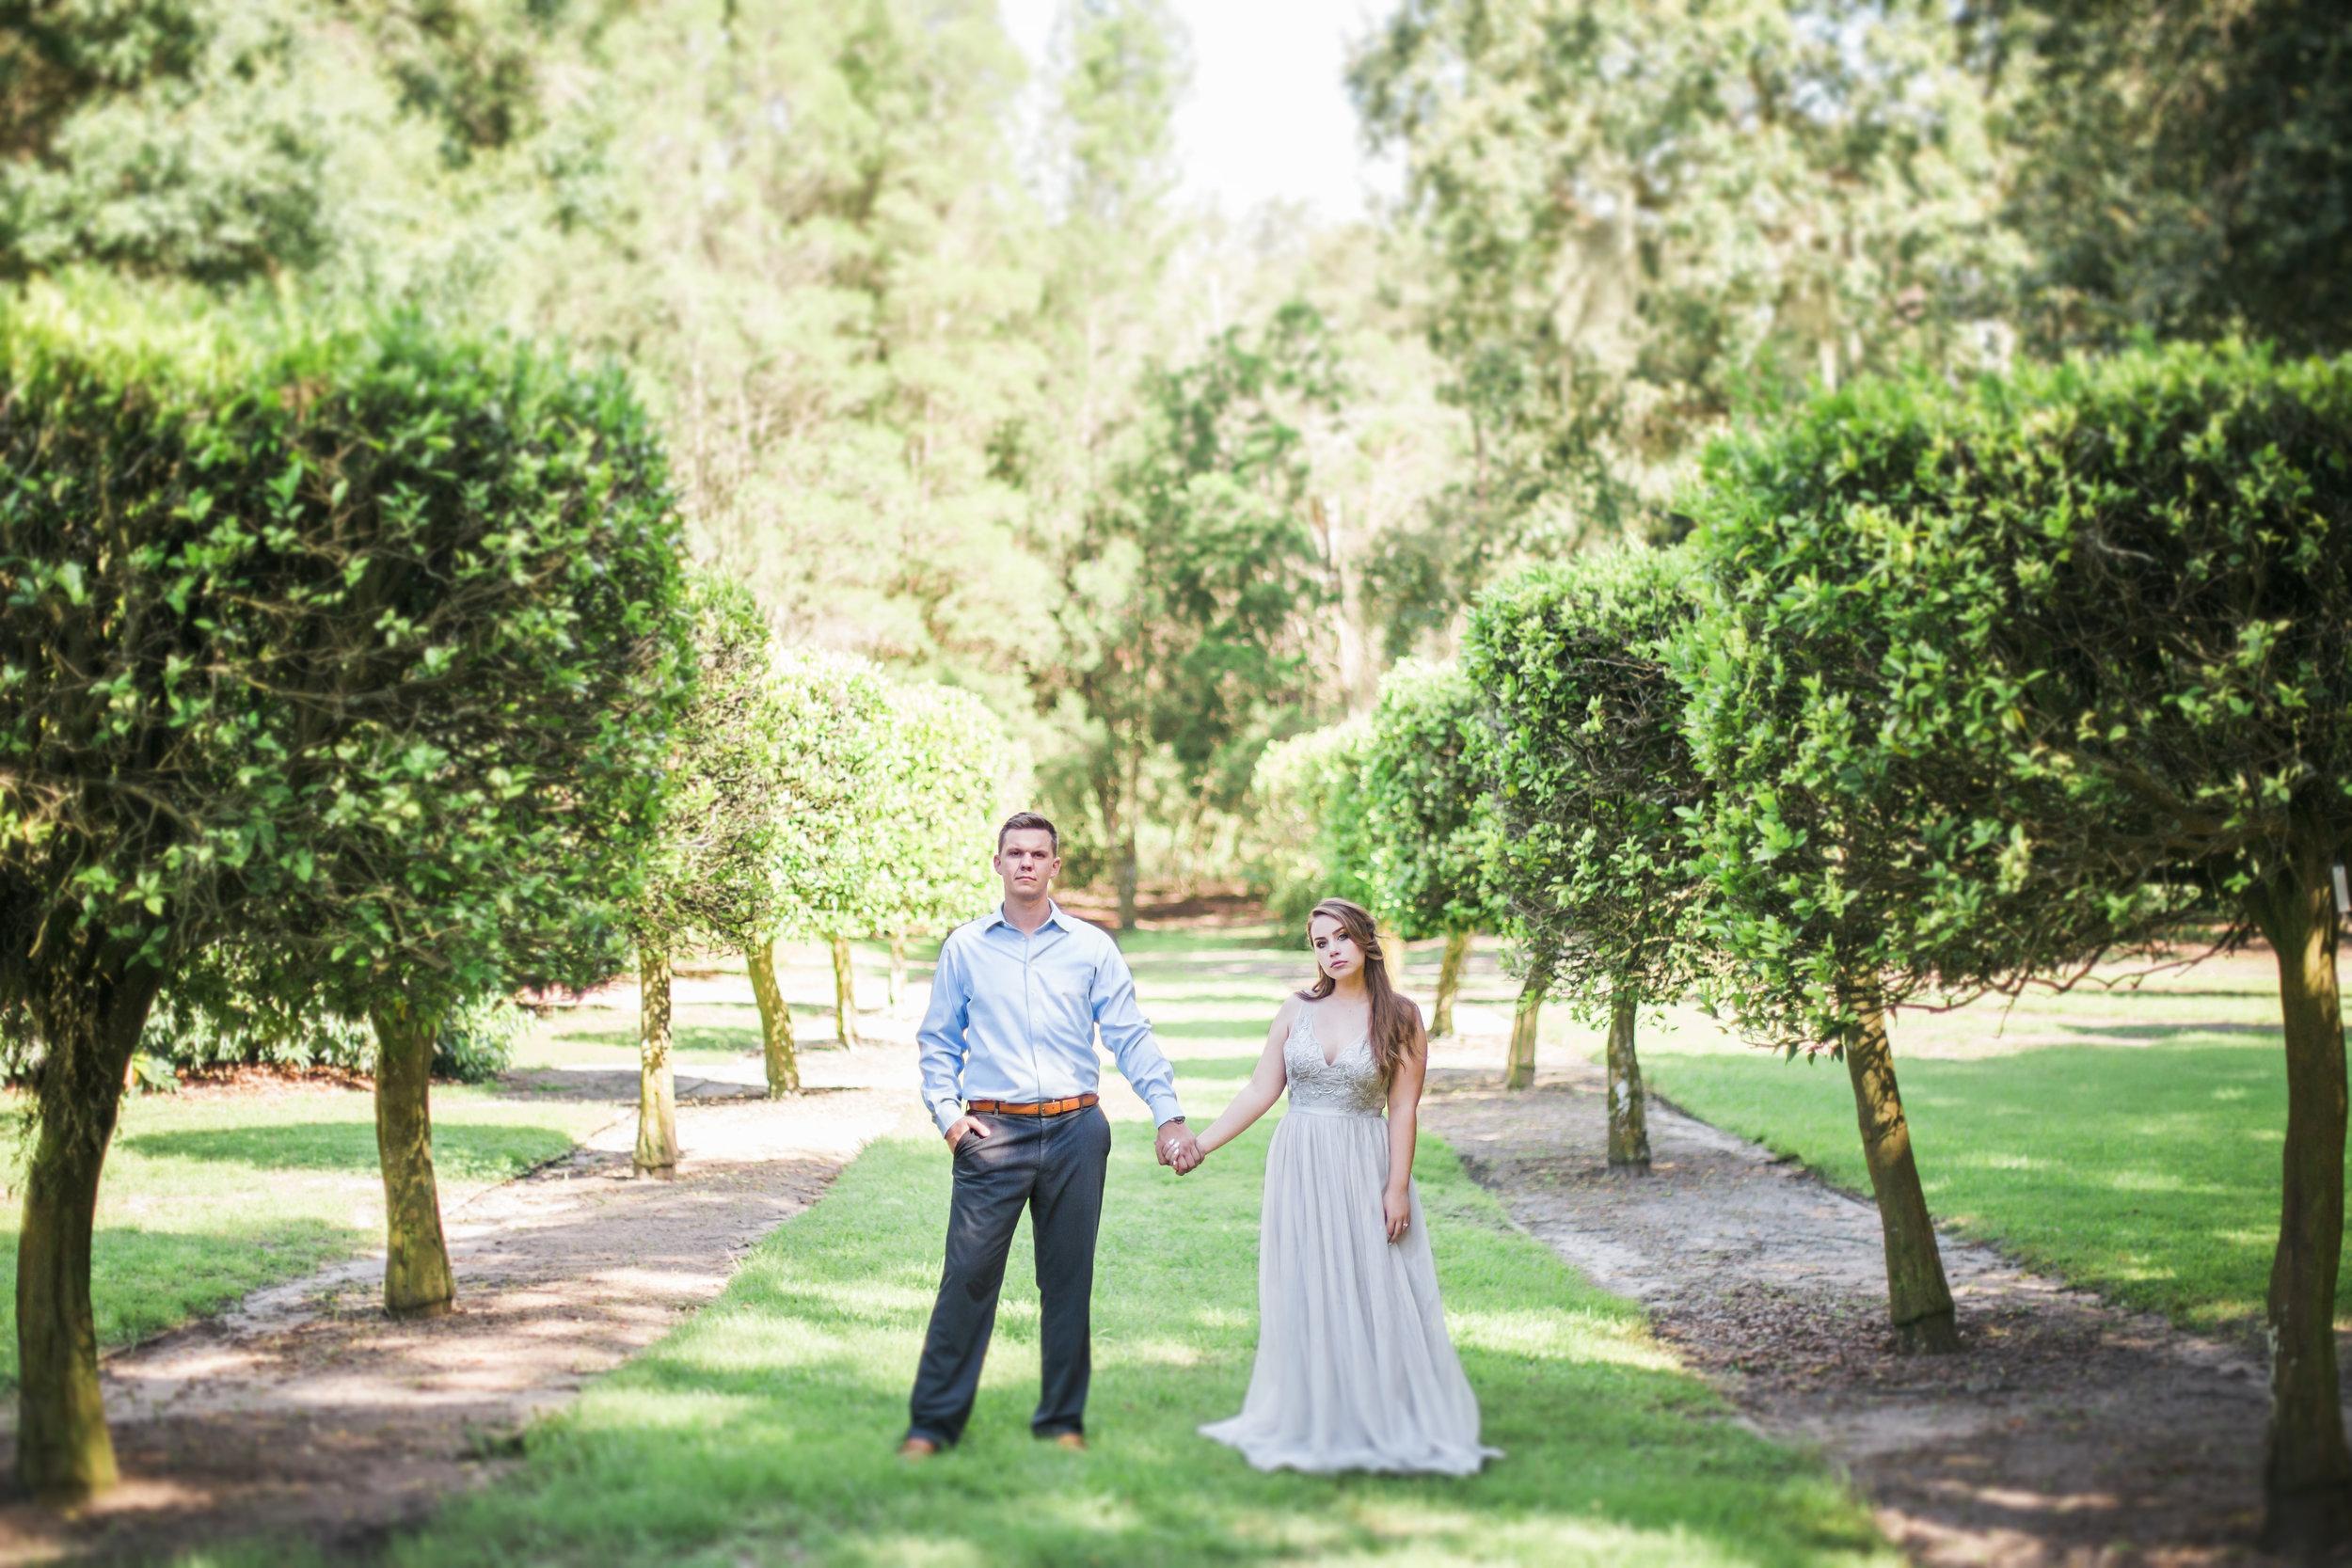 Scarlett + Derek - Bok Tower Gardens Wedding Photographer - Bok Tower Gardens Engagement Session - Preview Photos - Emily & Co. Photography (54).jpg